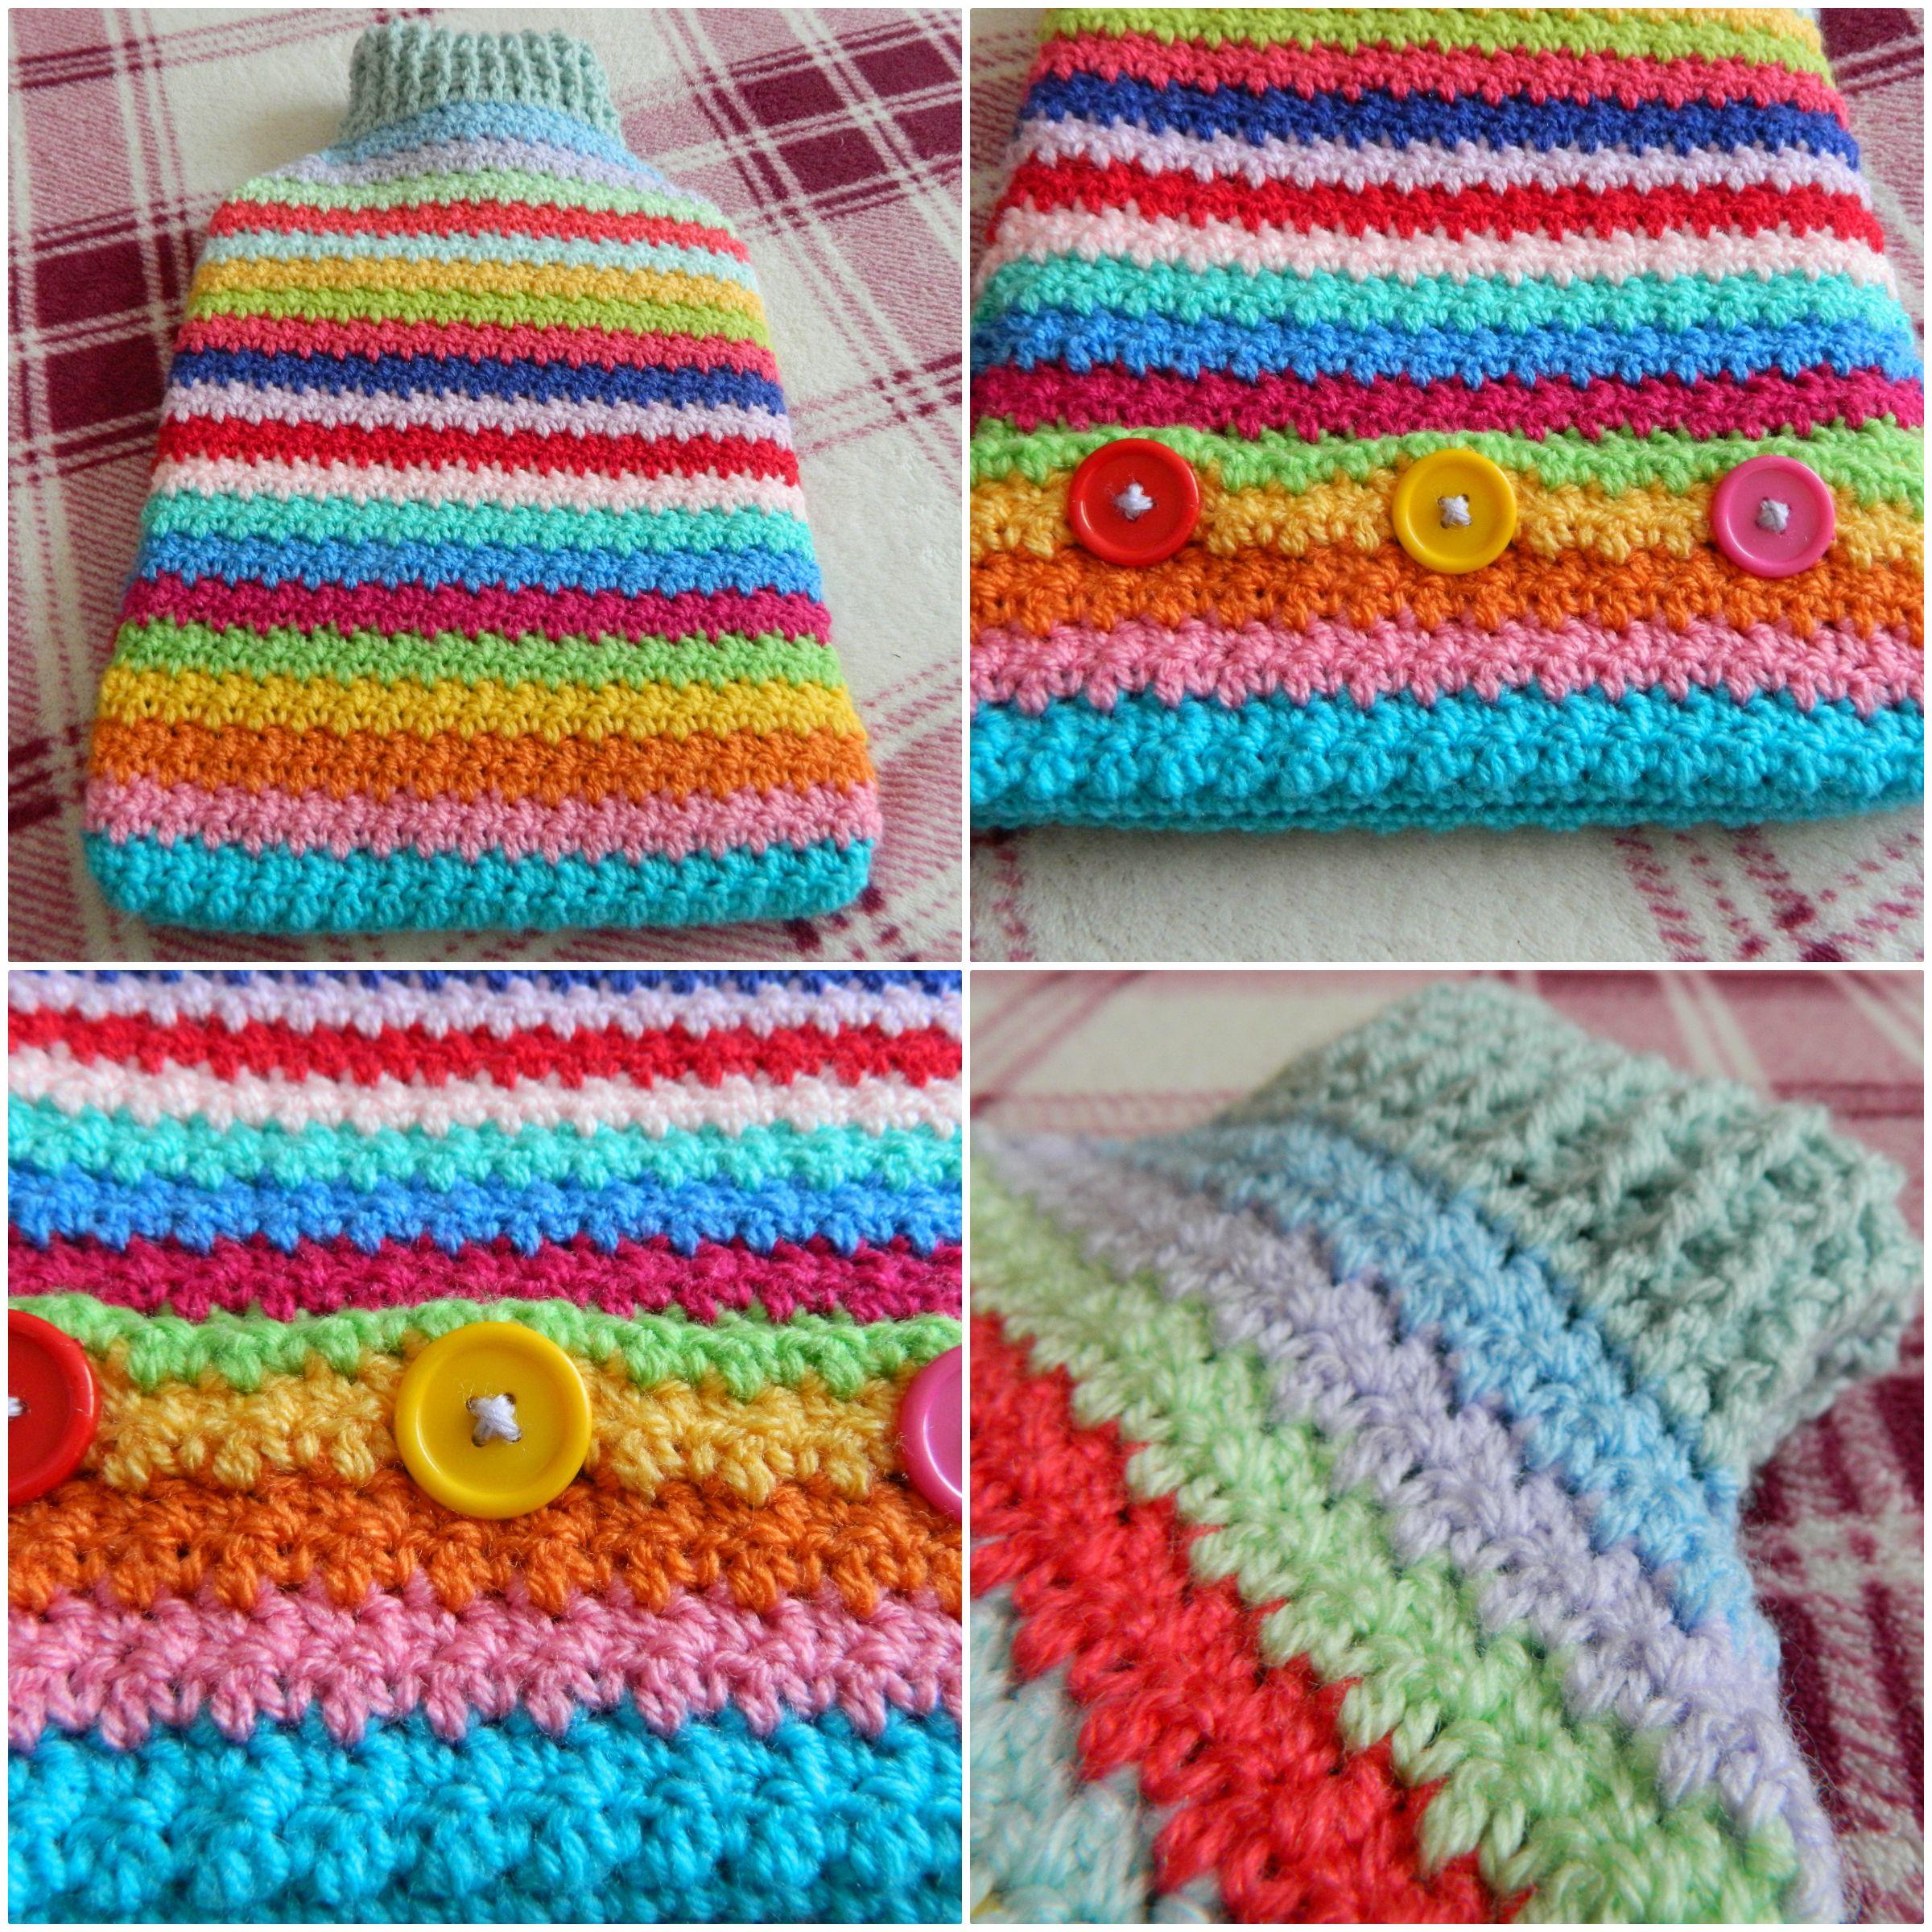 Crochet hot water bottle cover | Stuff to Try | Pinterest | Water ...